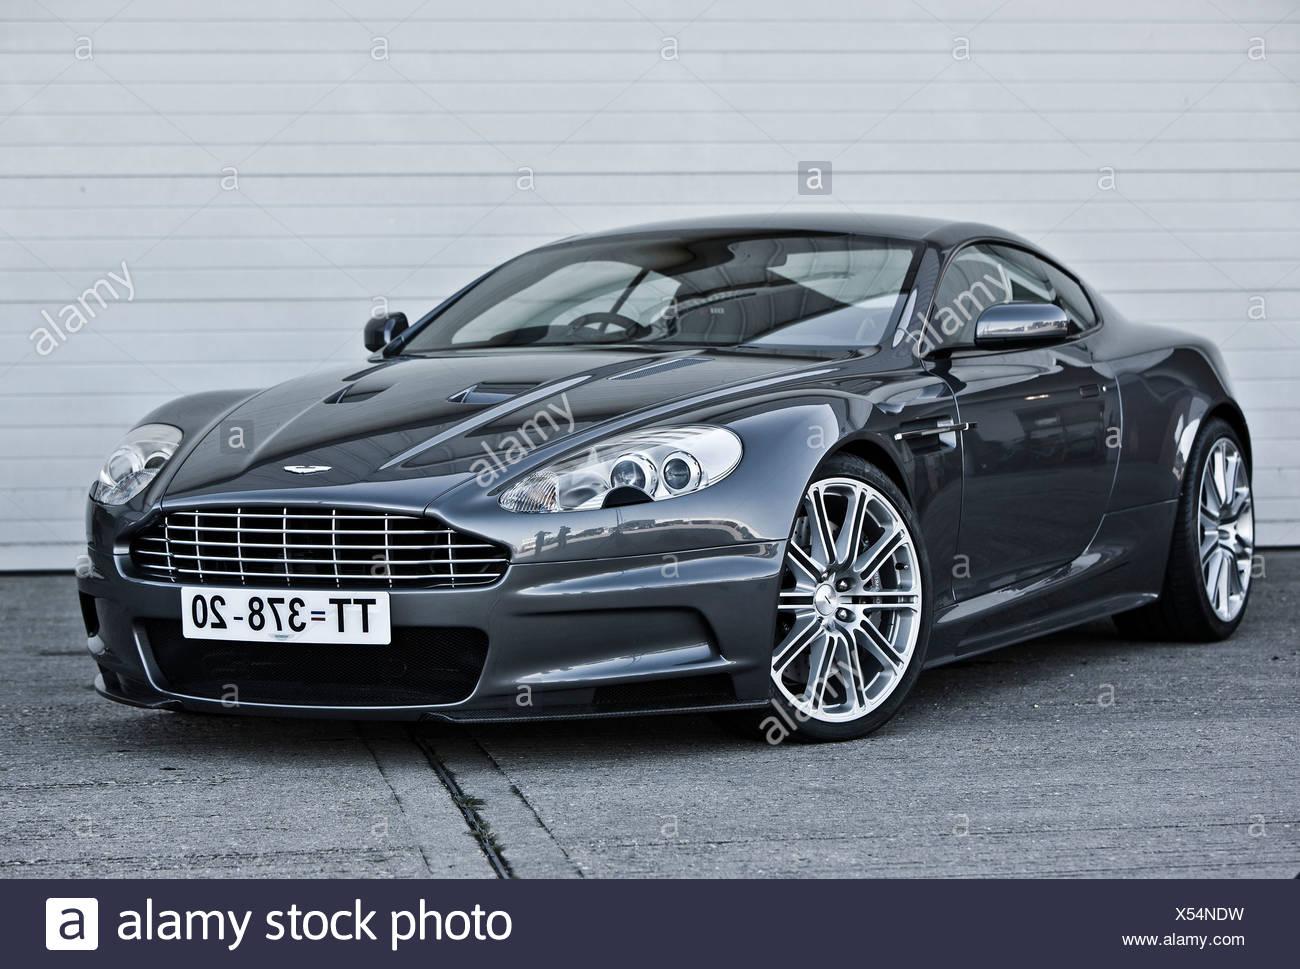 Stationary Aston Martin, James Bond classic car - Stock Image